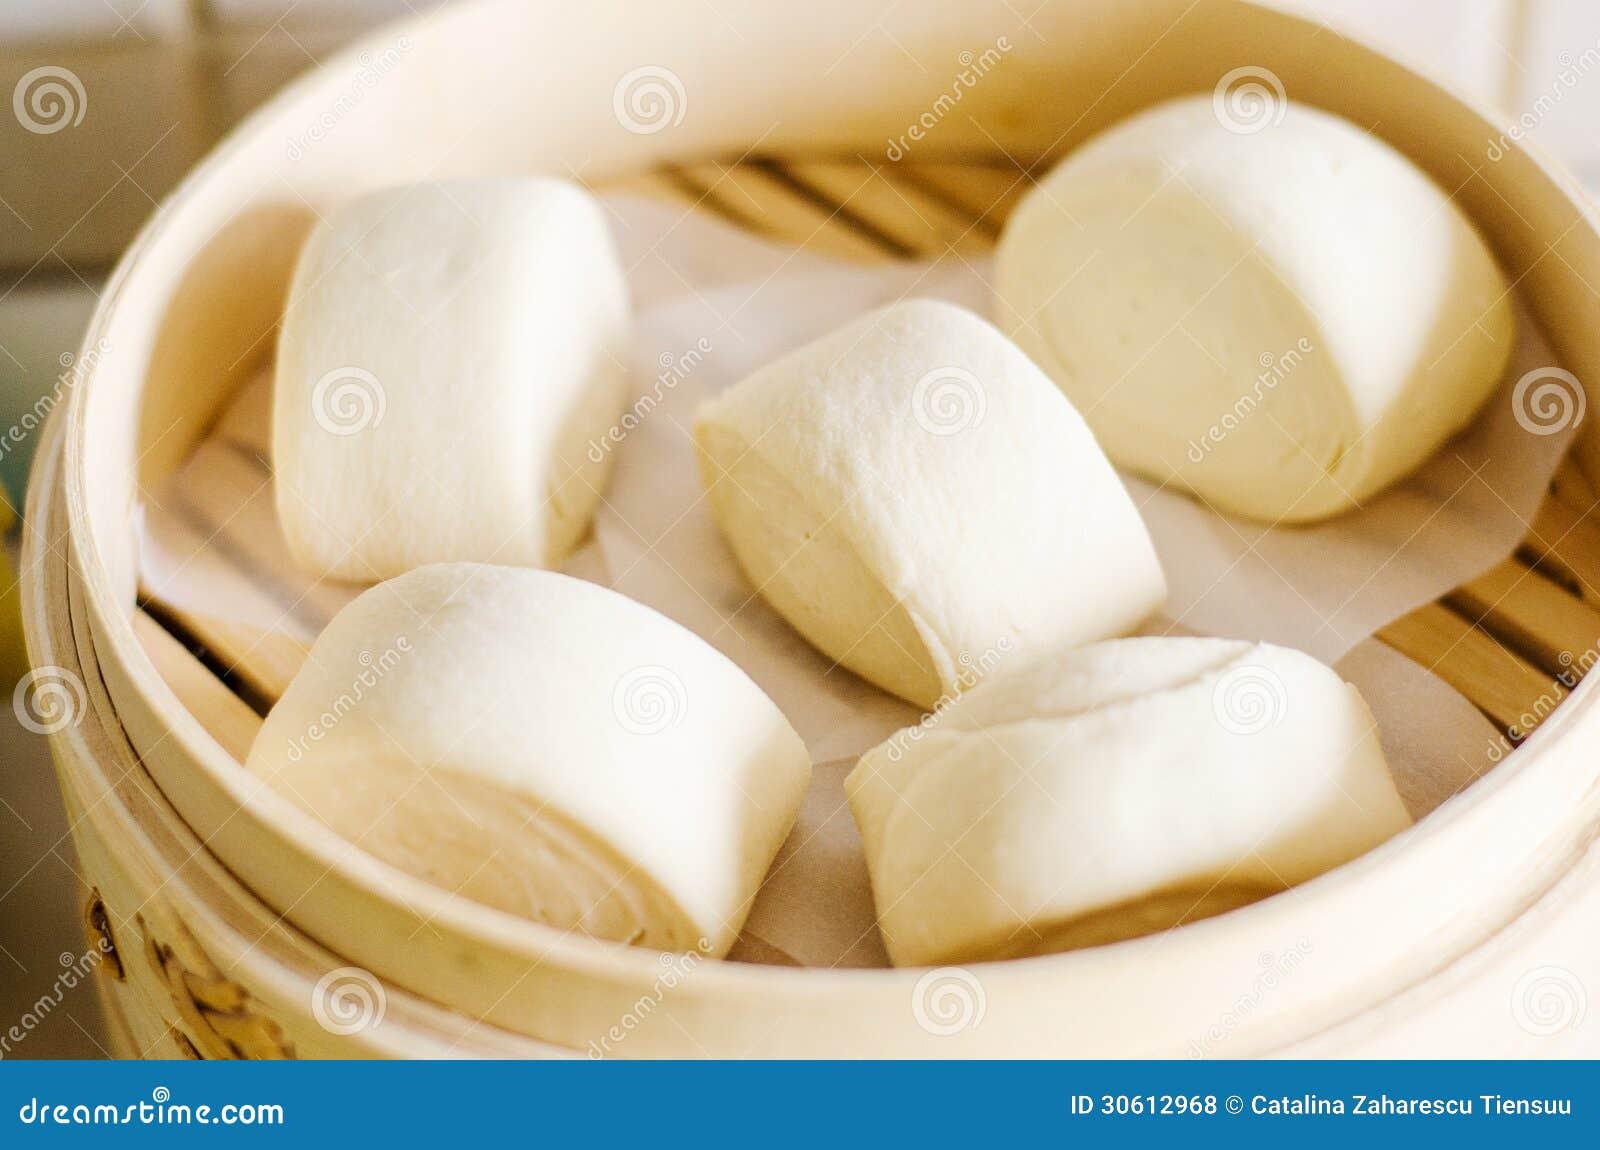 how to make steam bun dough white